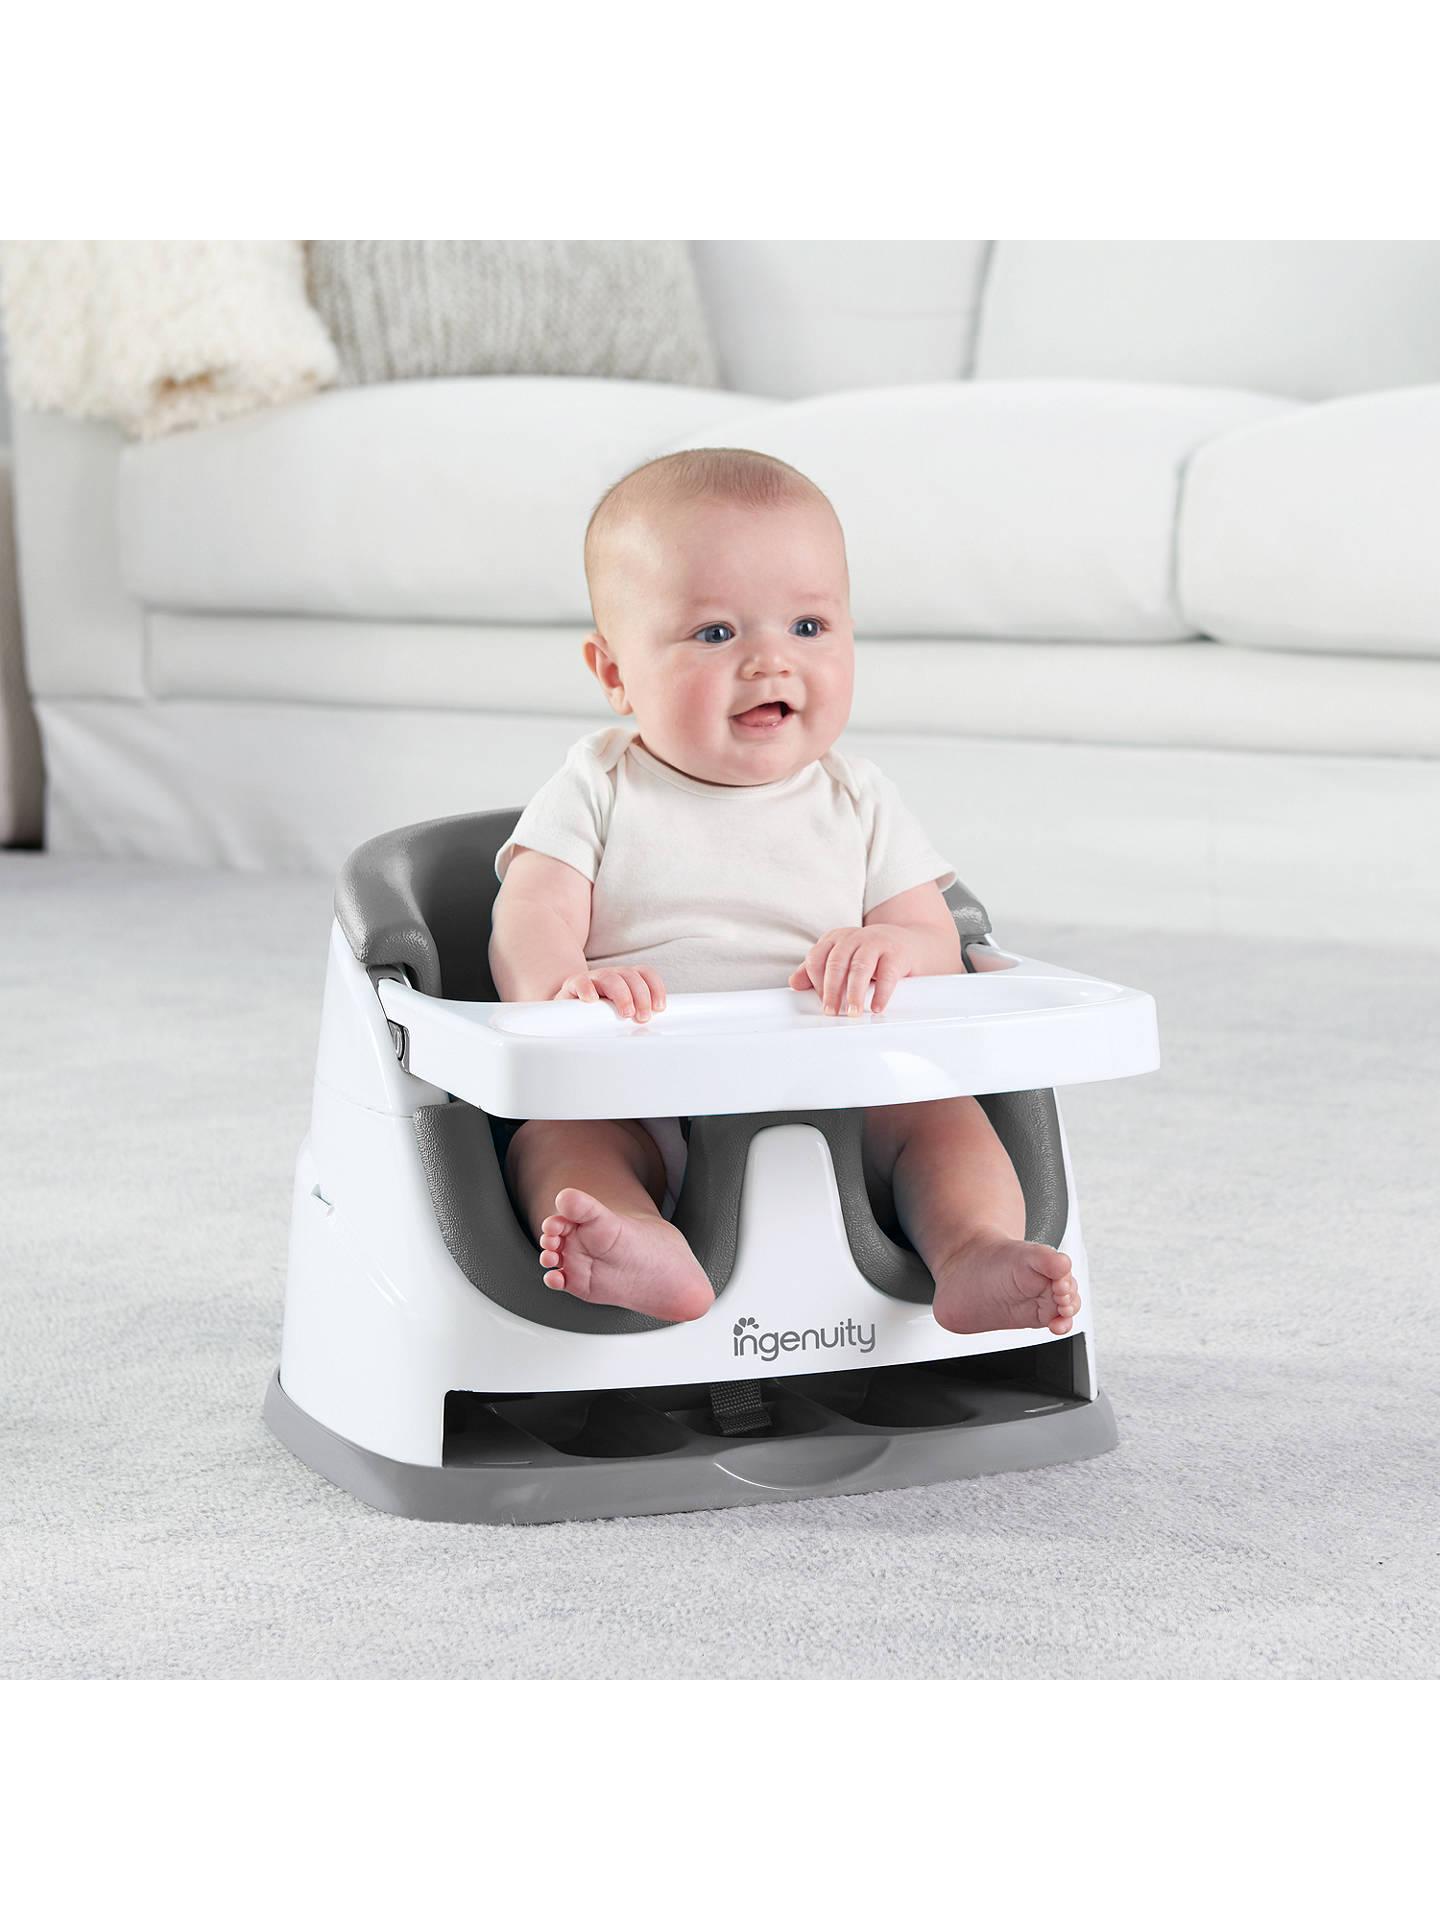 Ingenuity Baby Booster Feeding Seat At John Lewis Partners